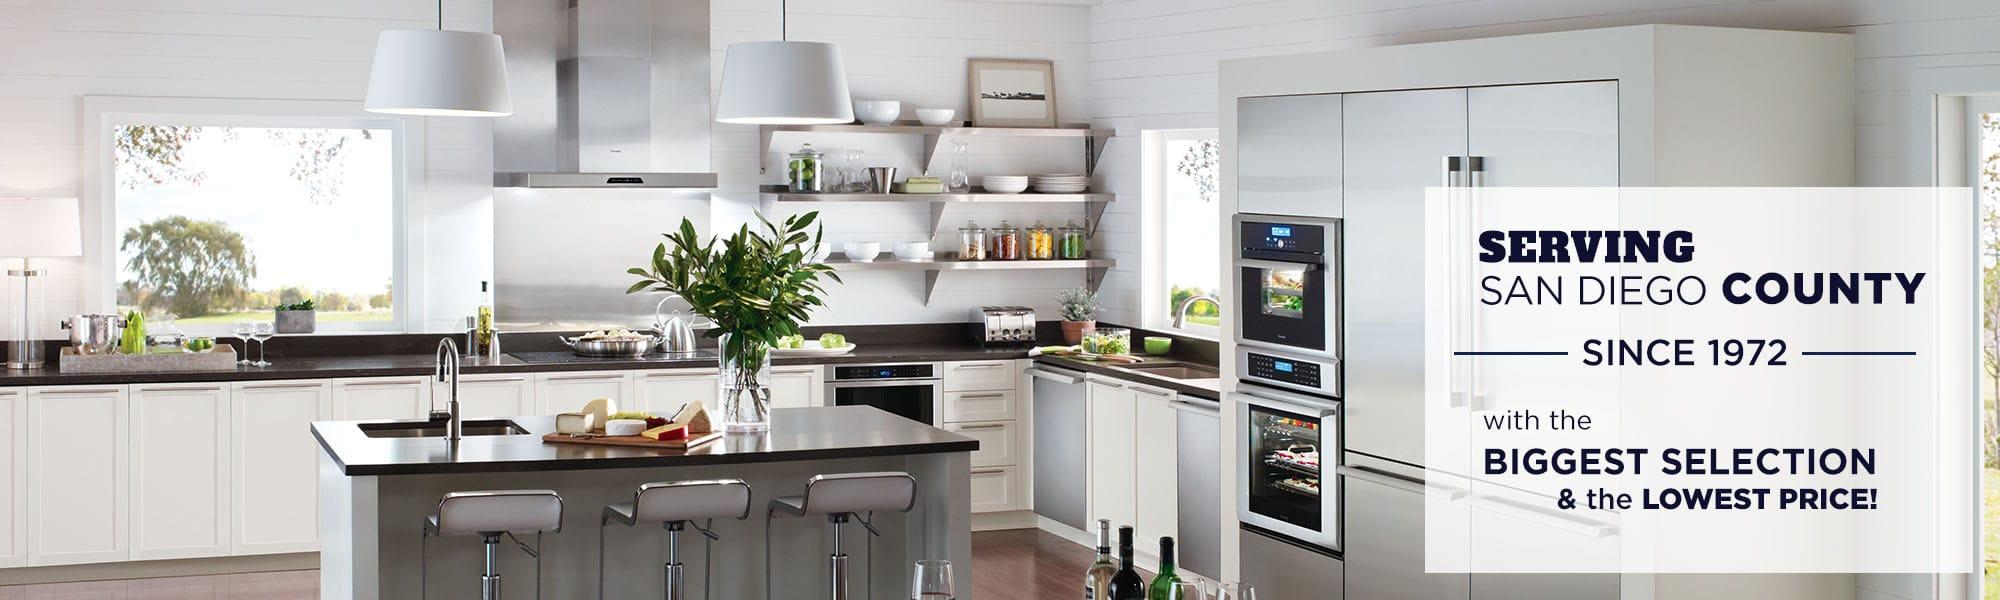 Aztec Appliance - Home Appliances - Kitchen Appliances - Mattress in ...